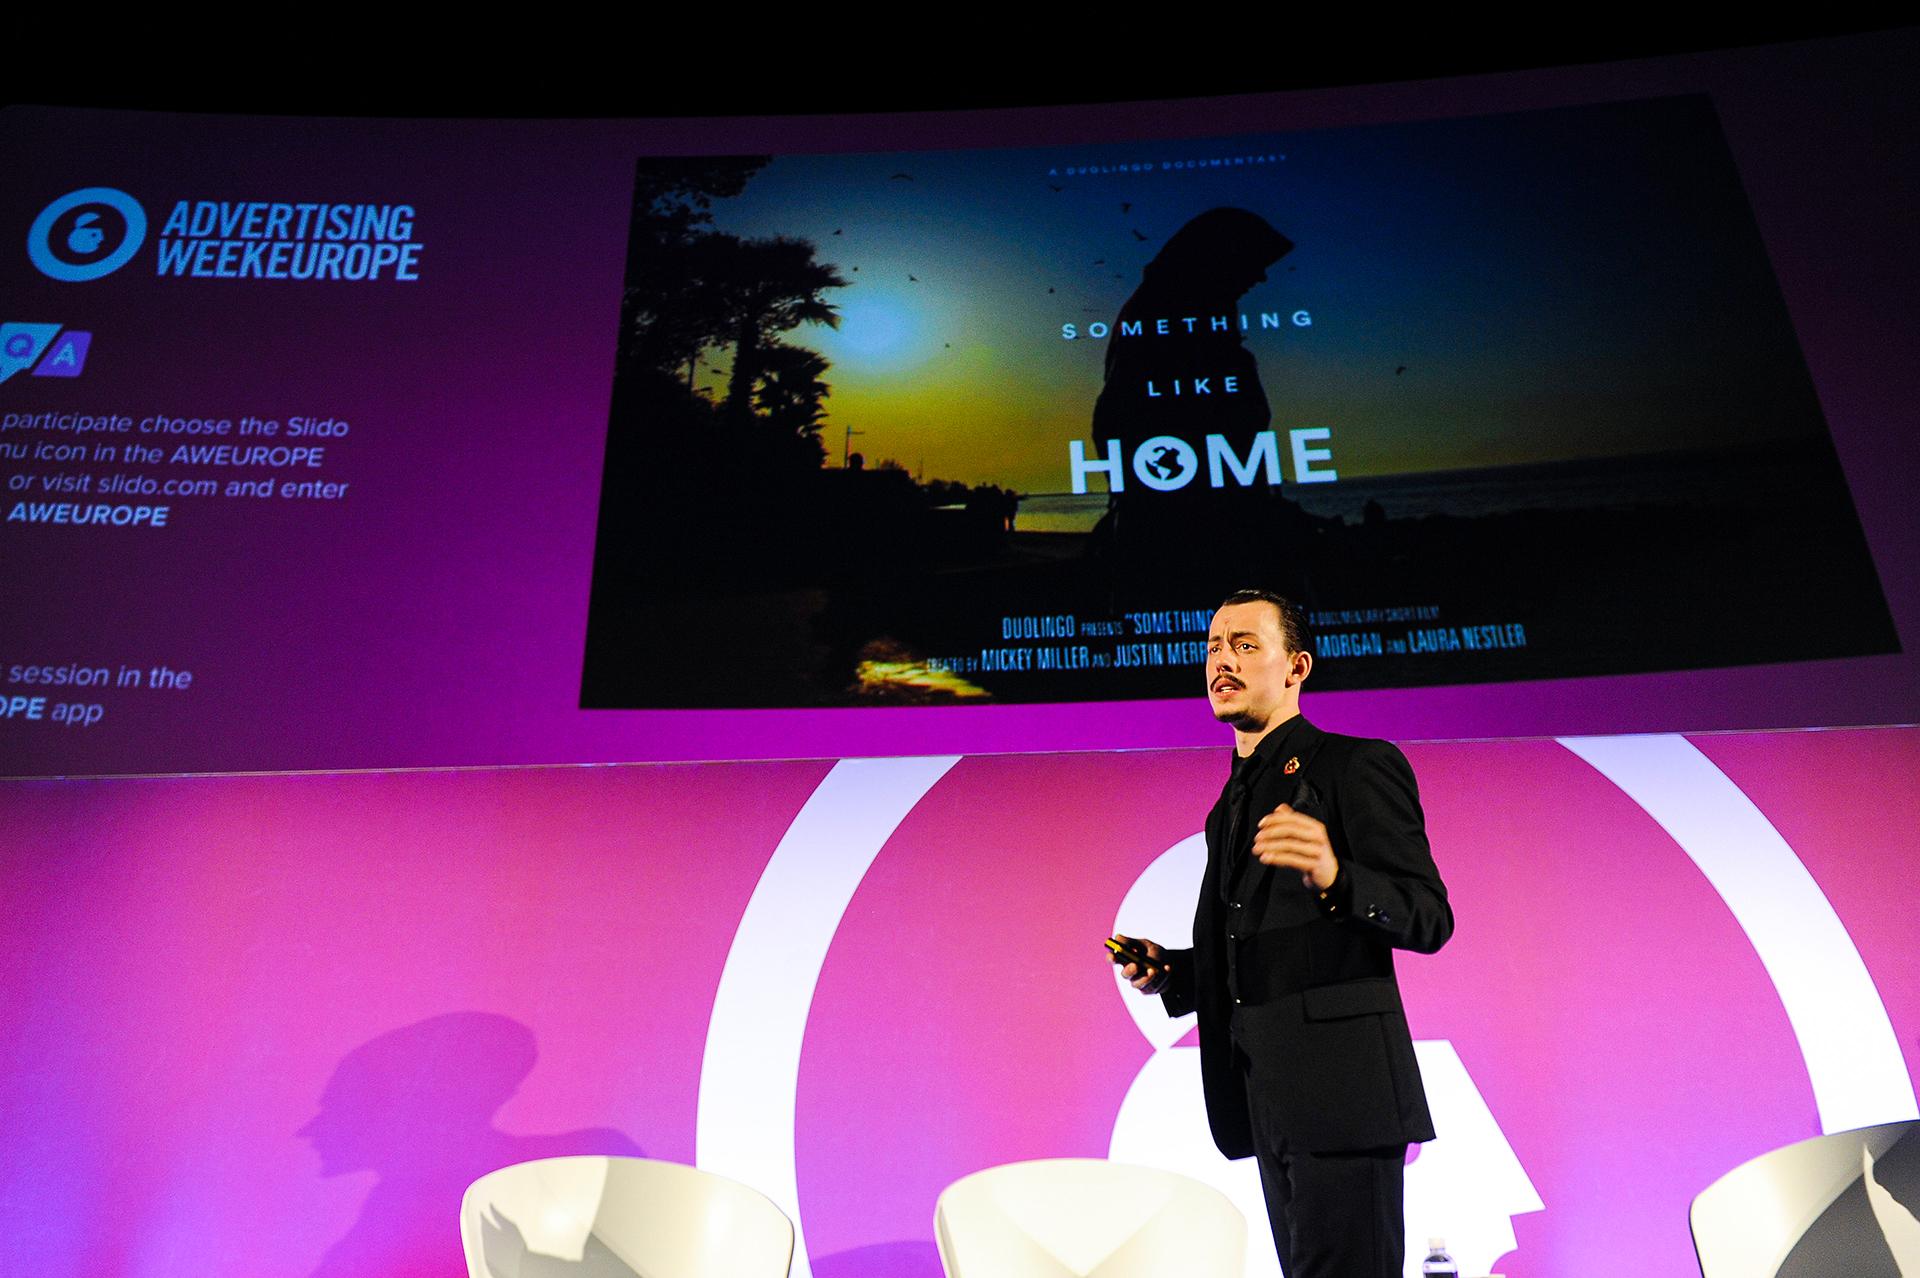 Jack Morgan speaking at Advertising Week Europe